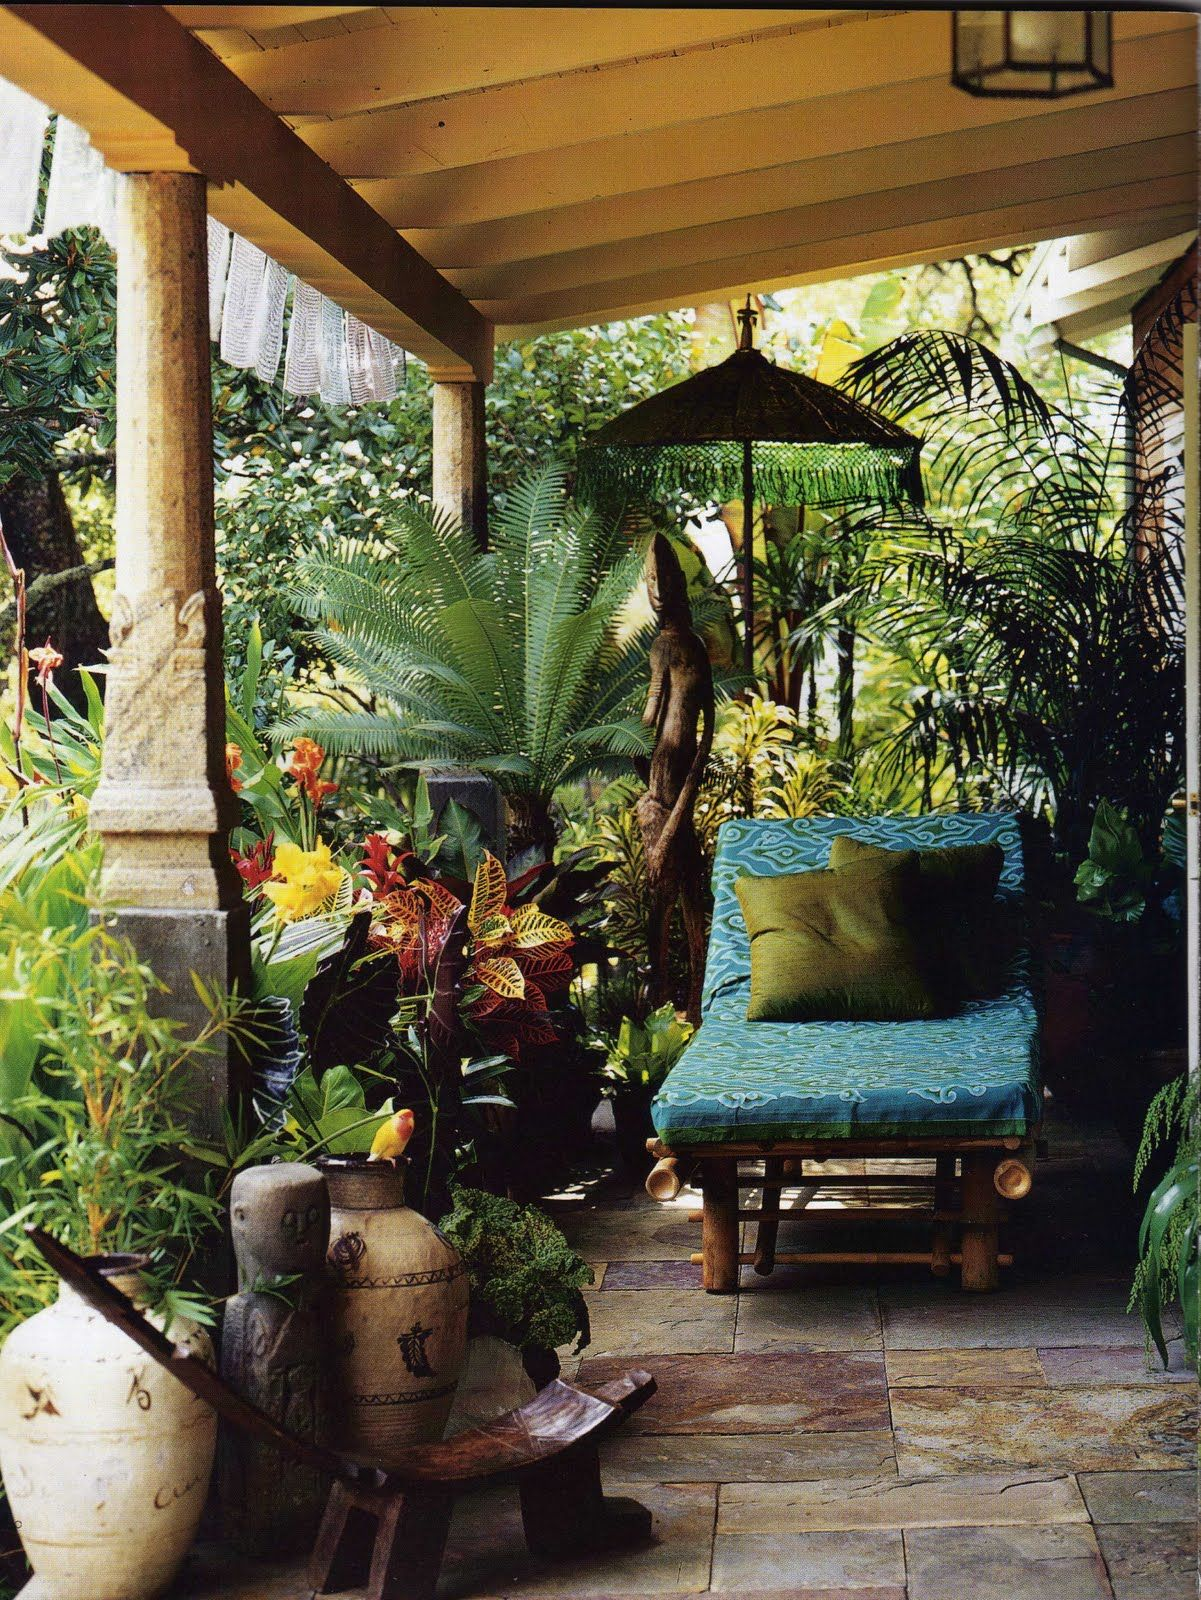 Bursting With Tropical Plants, Art, Sculpture, Umbrellas, And Furniture  Hiddenu2026